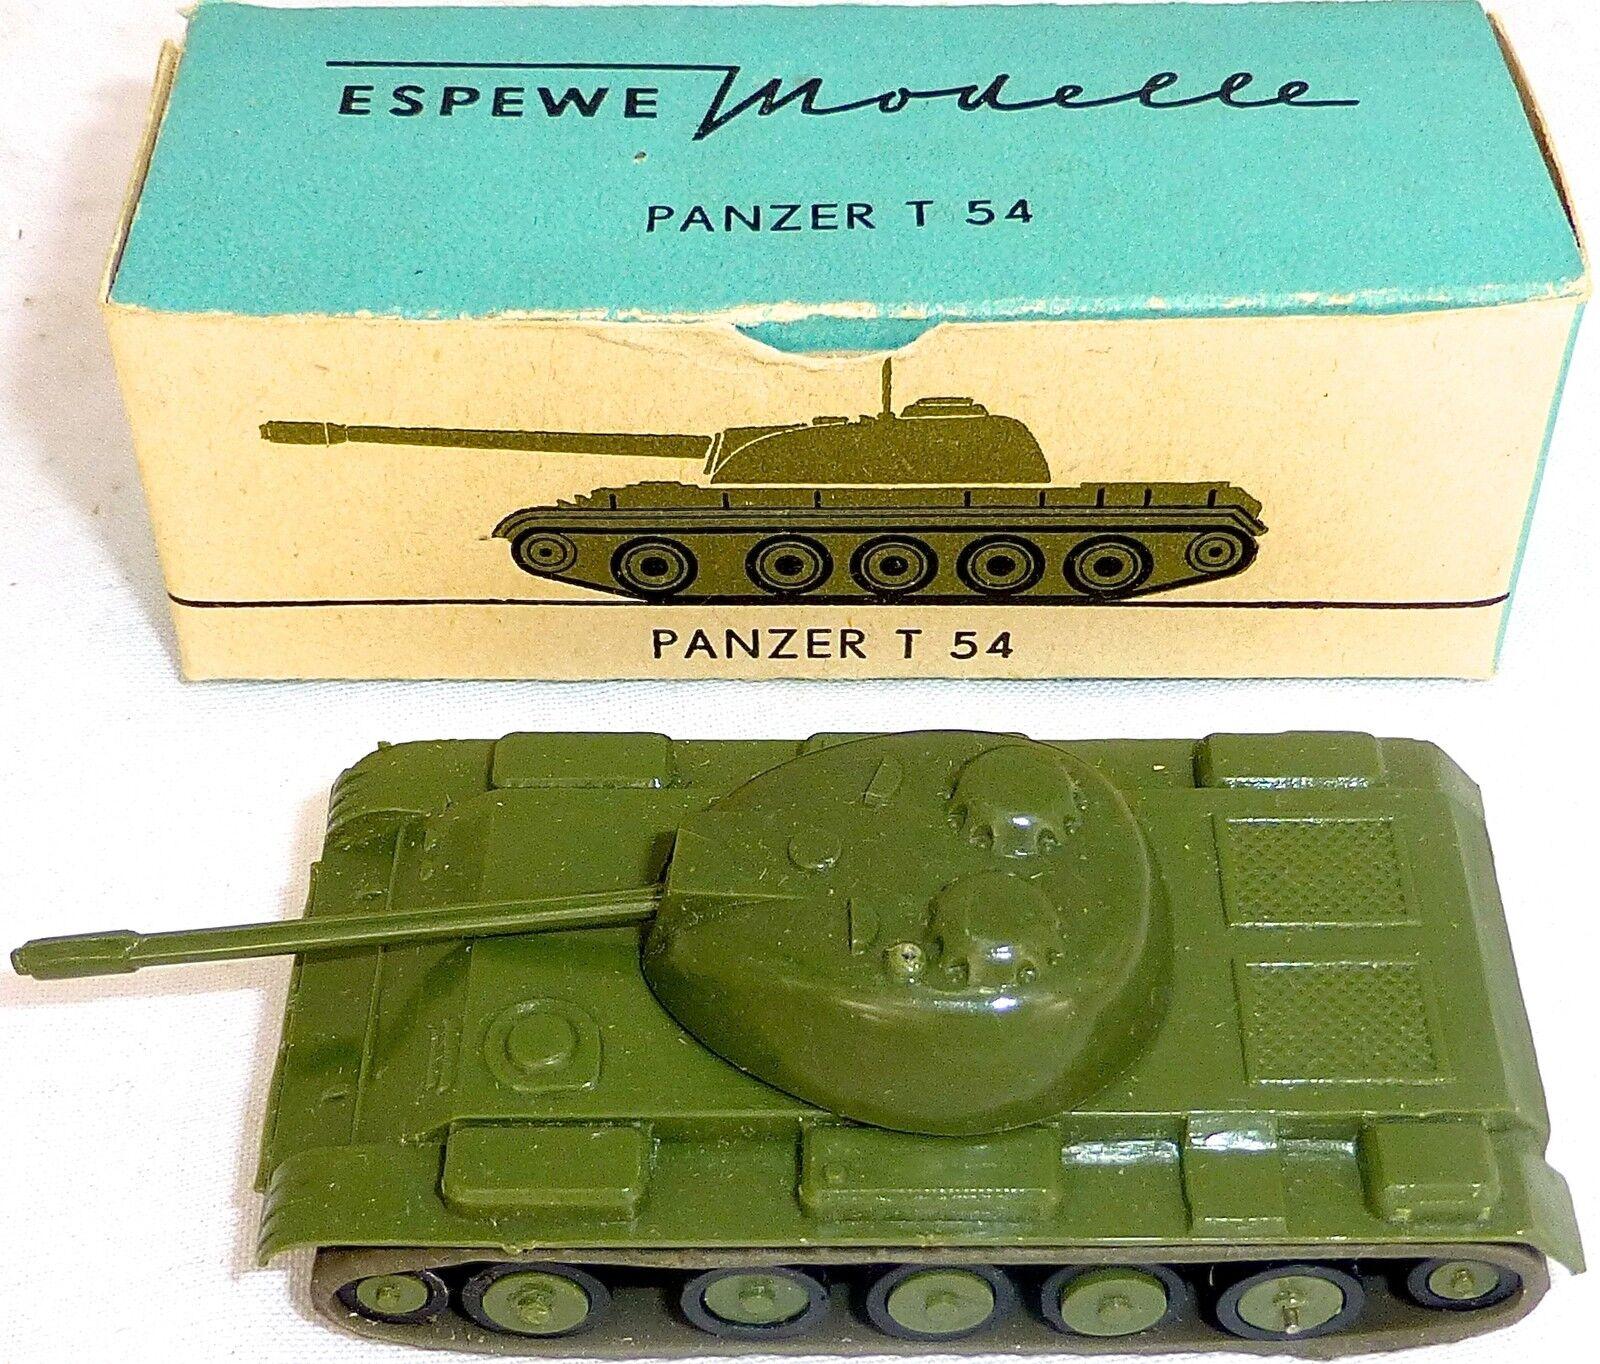 T 54 Armee Panzer Panzer Panzer DDR VEB ESPEWE Berlin OVP H0 HN5 å c57955